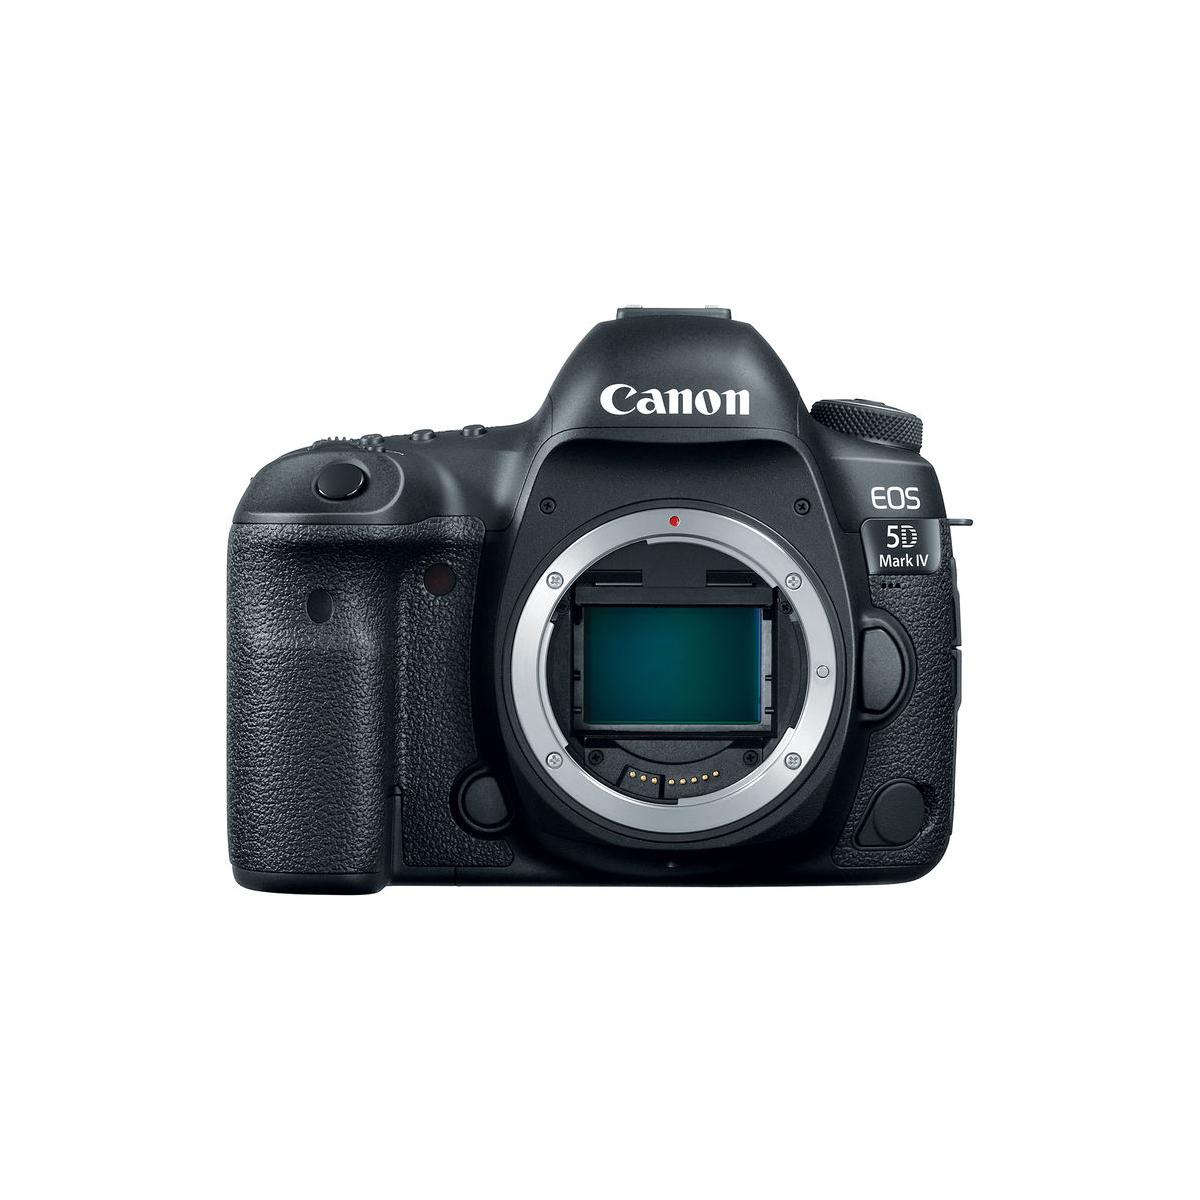 Canon Eos 5d Mark Iv Dslr Body The Camera Exchange Inc